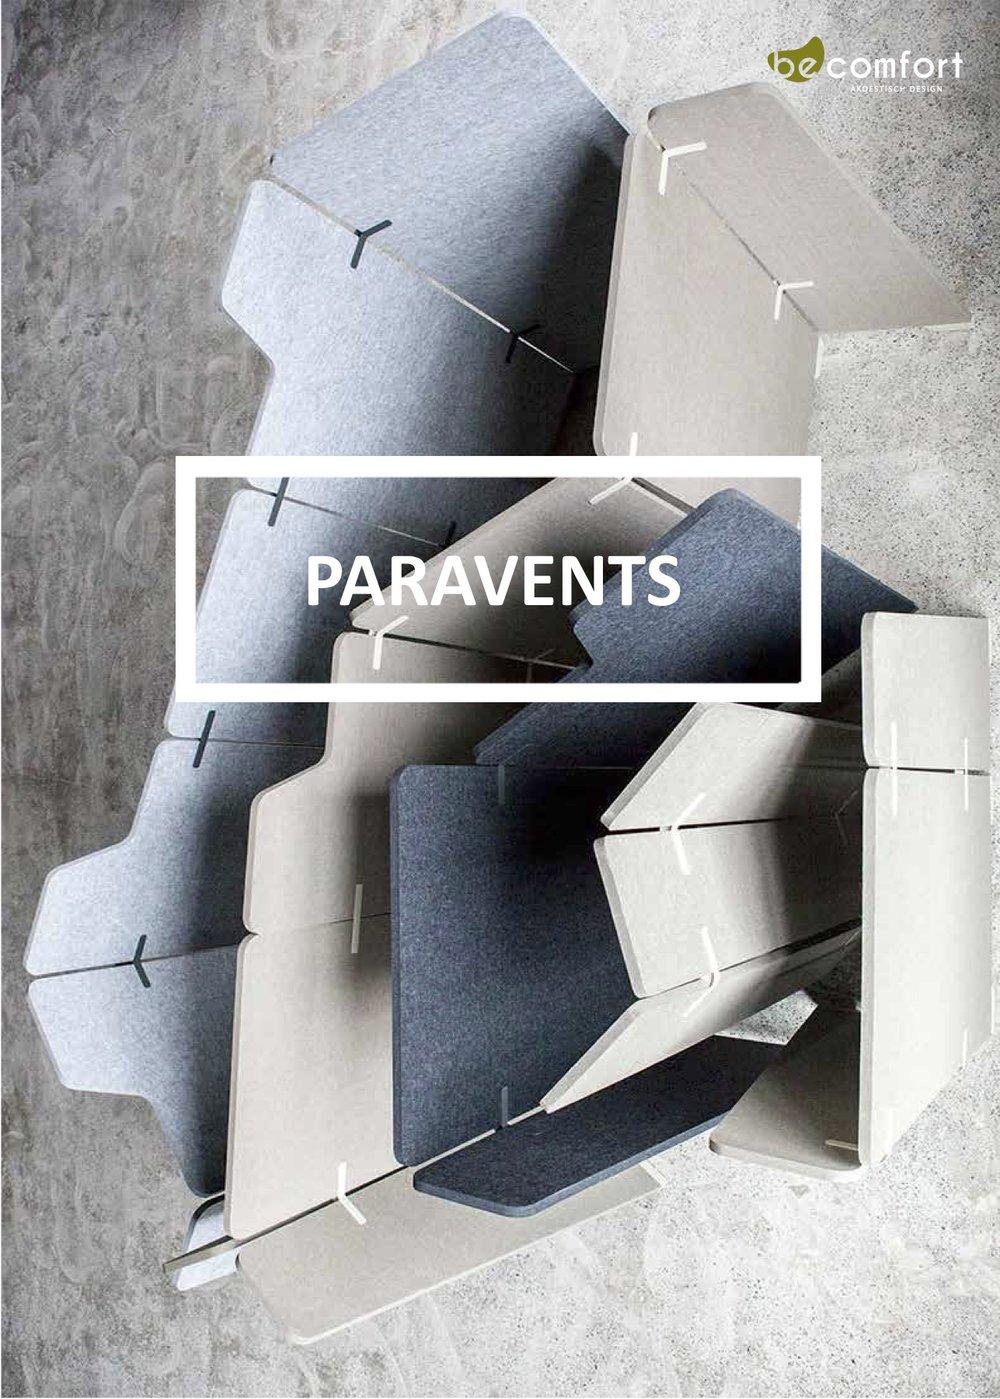 BeComfort Paravent sm.jpg